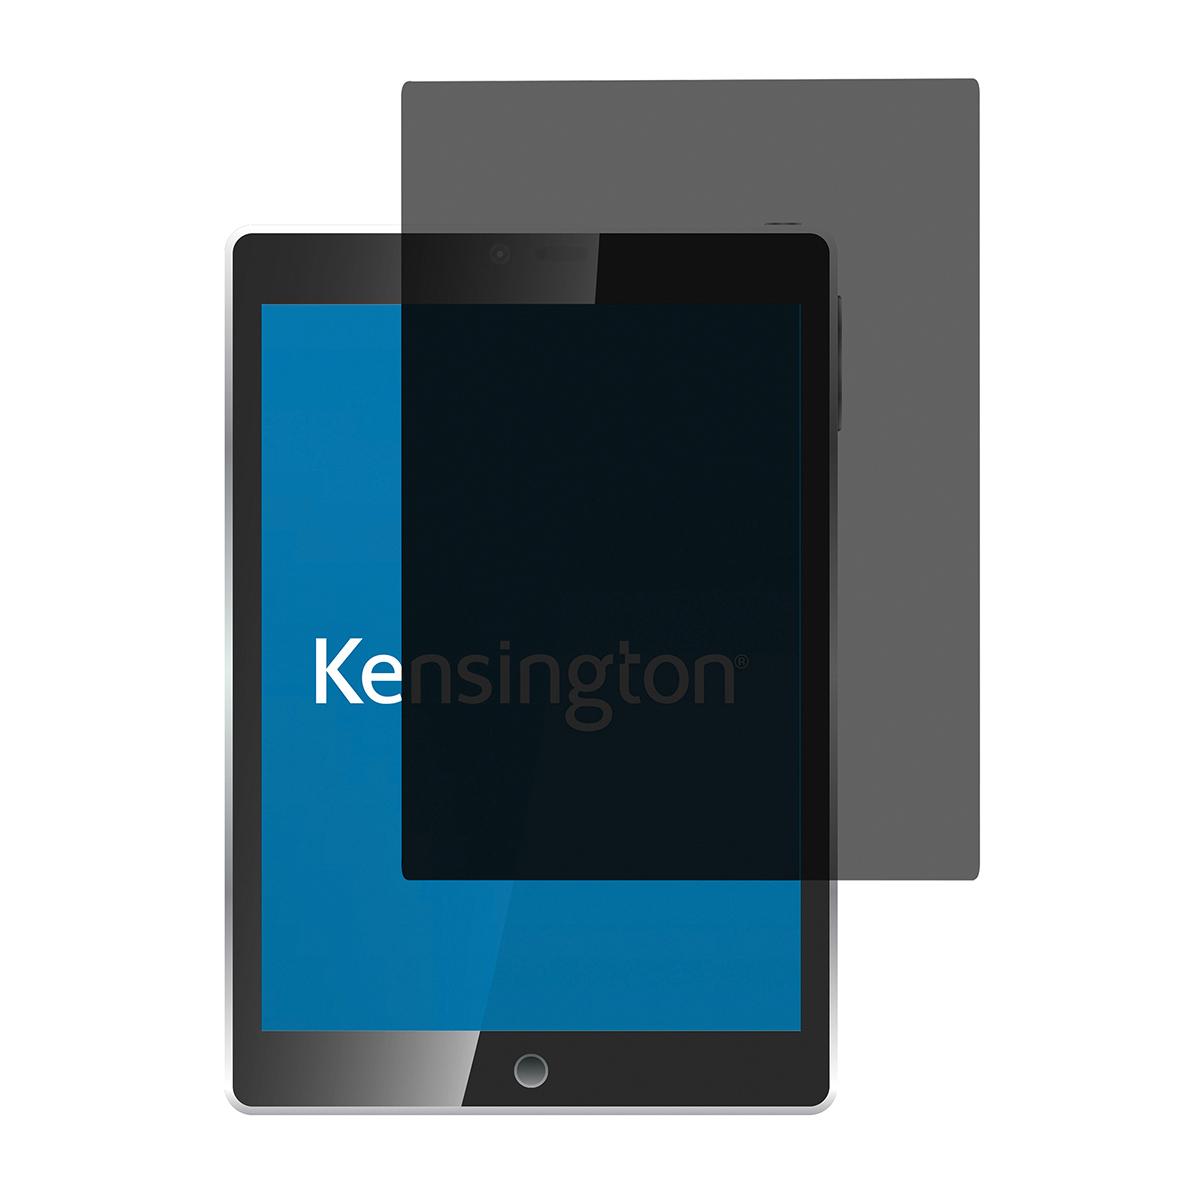 Kensington 626392 Privacy Filter 2 Way Adhesive for iPad Air - iPad Pro 9.7 Inch - iPad 2017